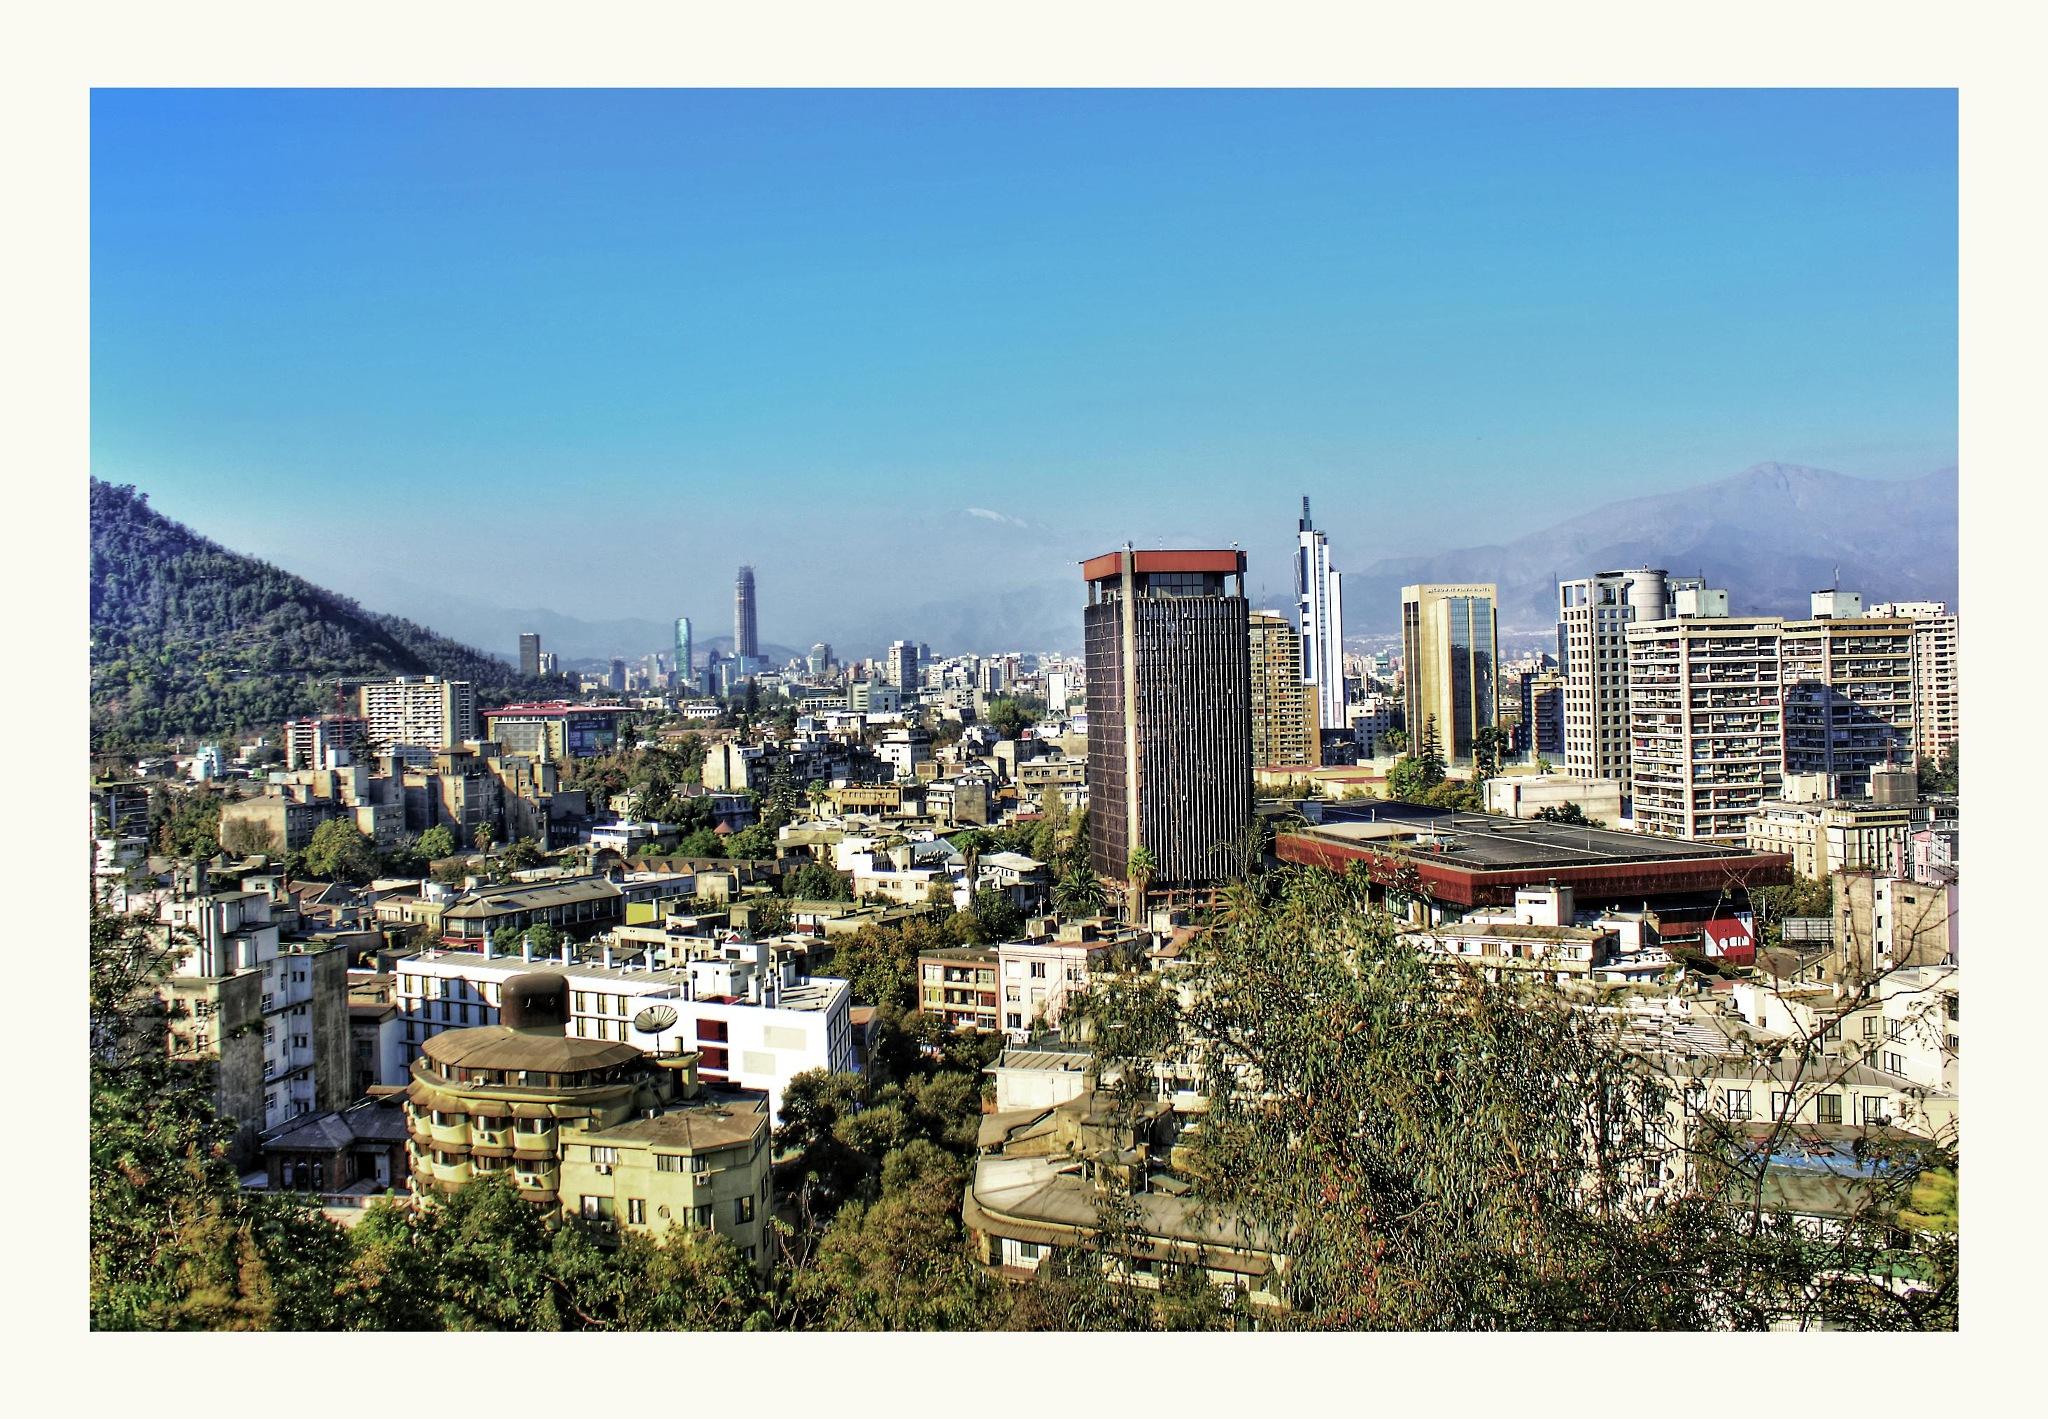 Santiago de Chile by Mauro Chk Hernandez